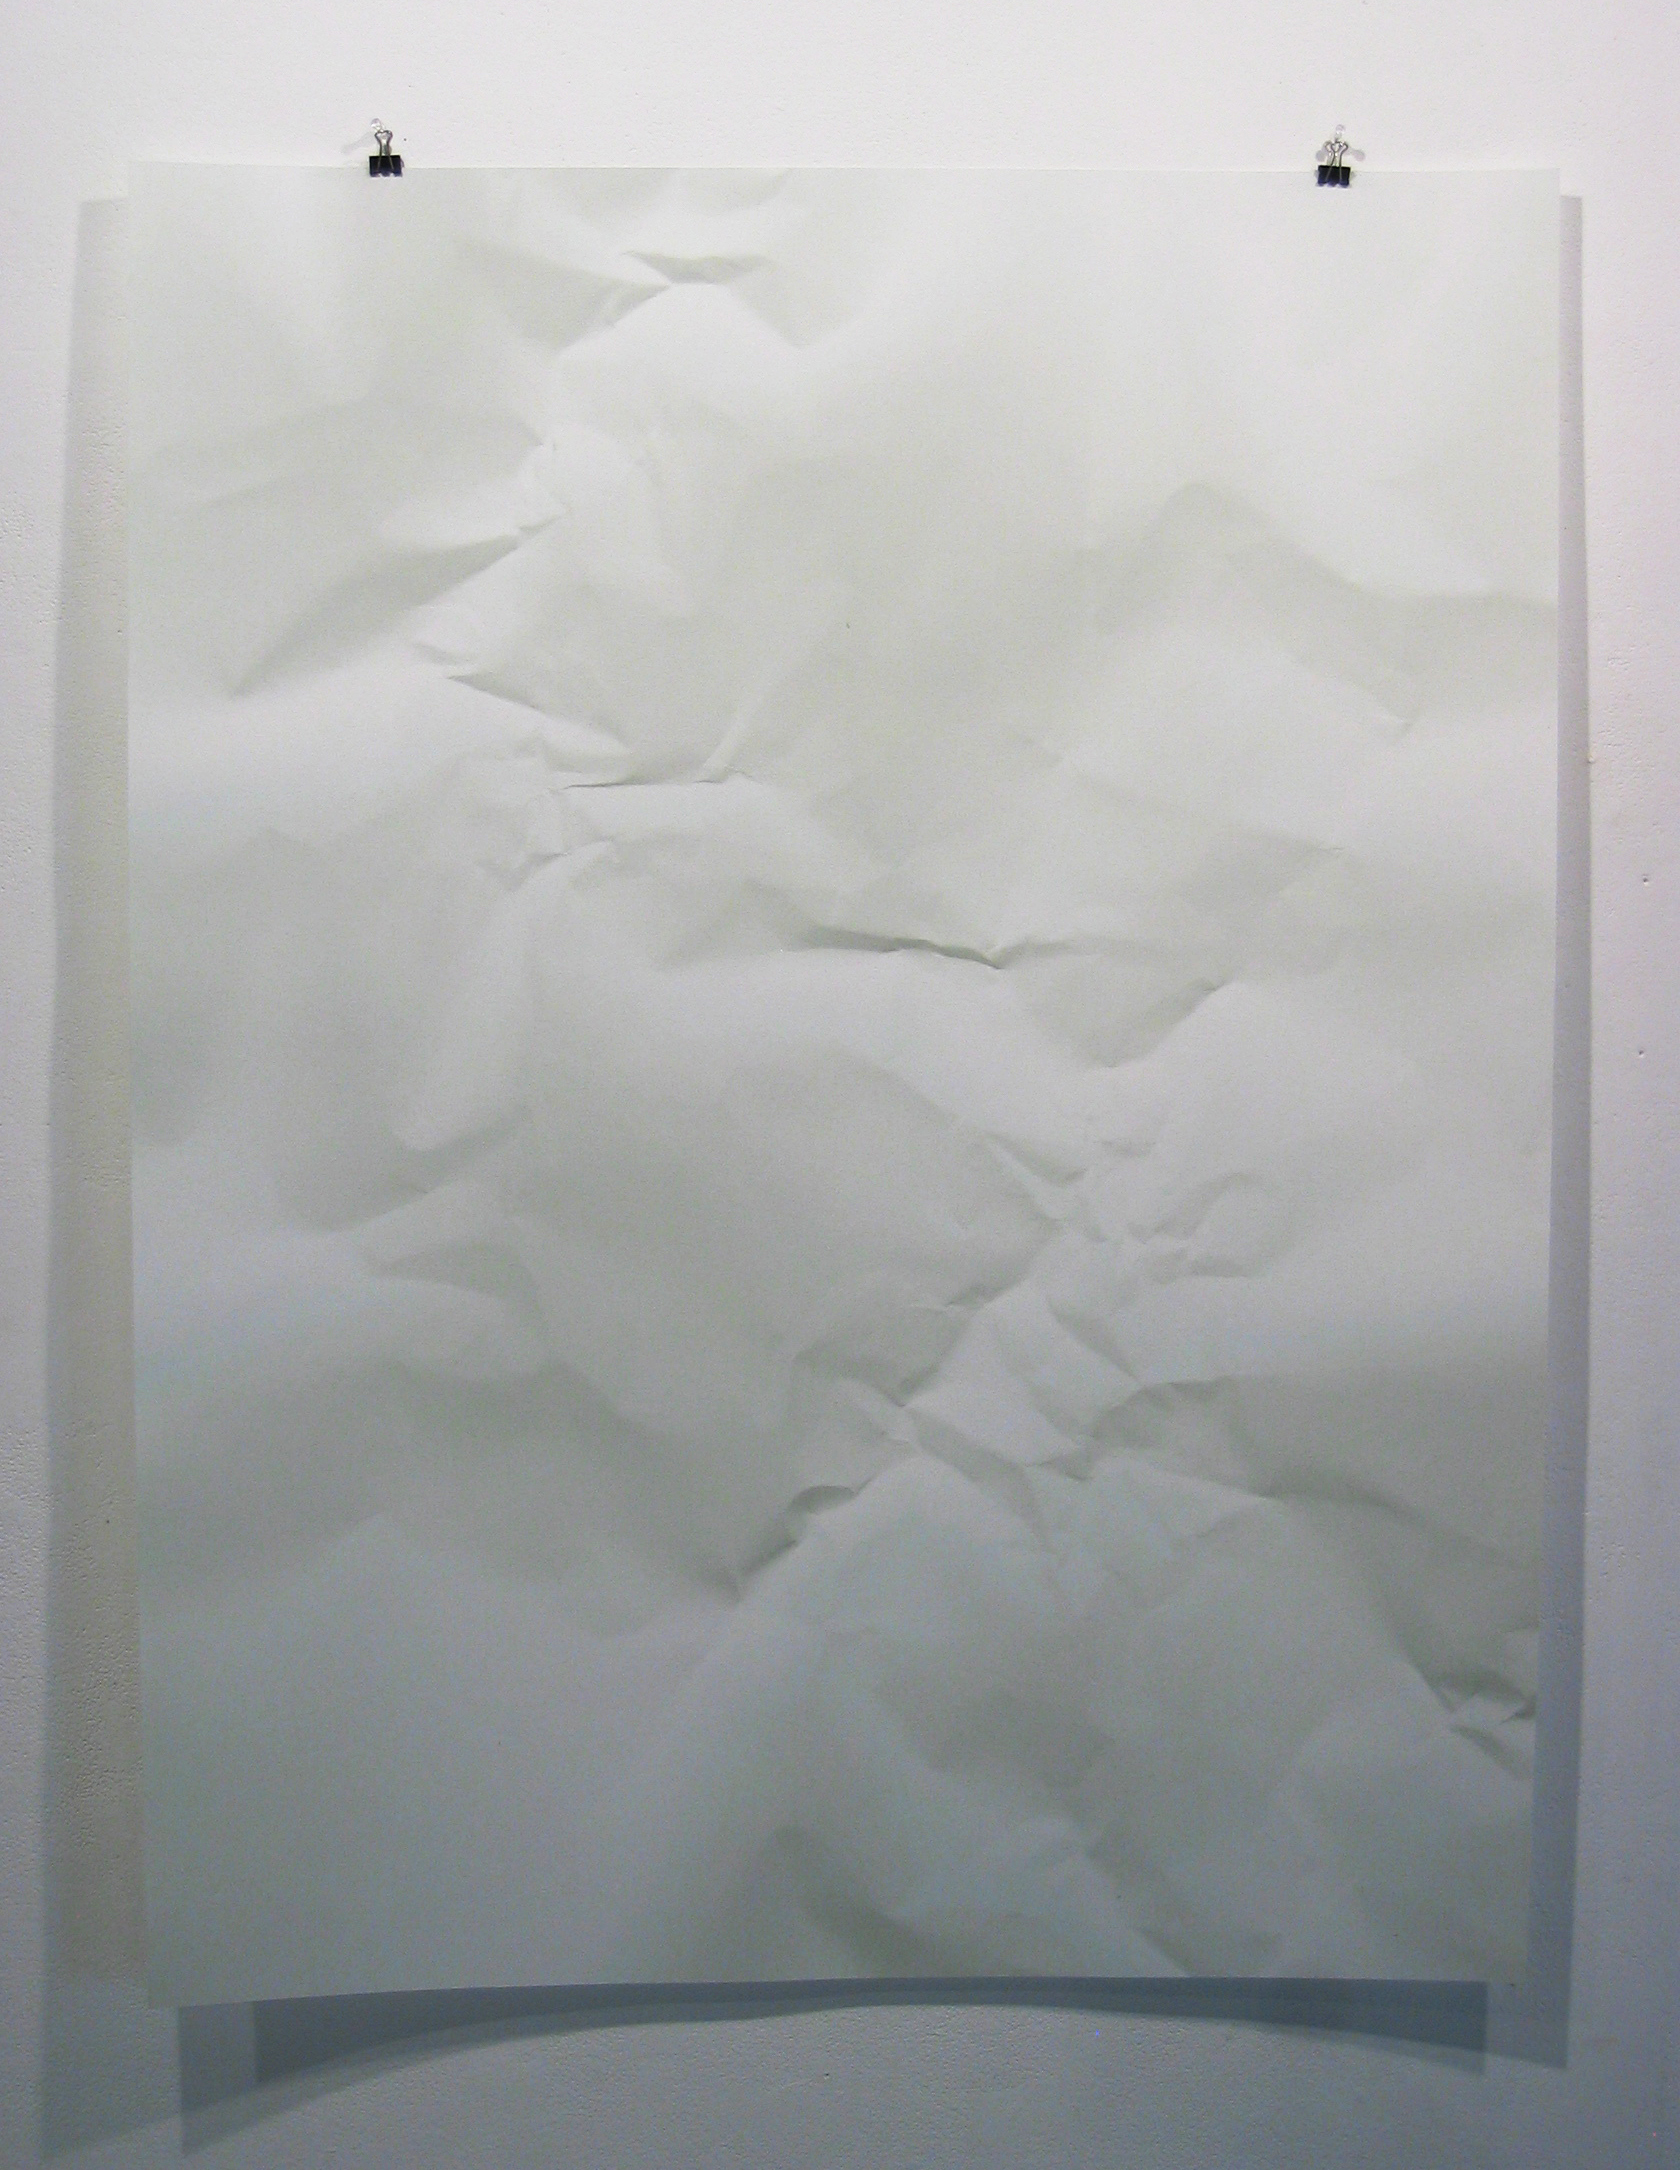 Digital print on paper